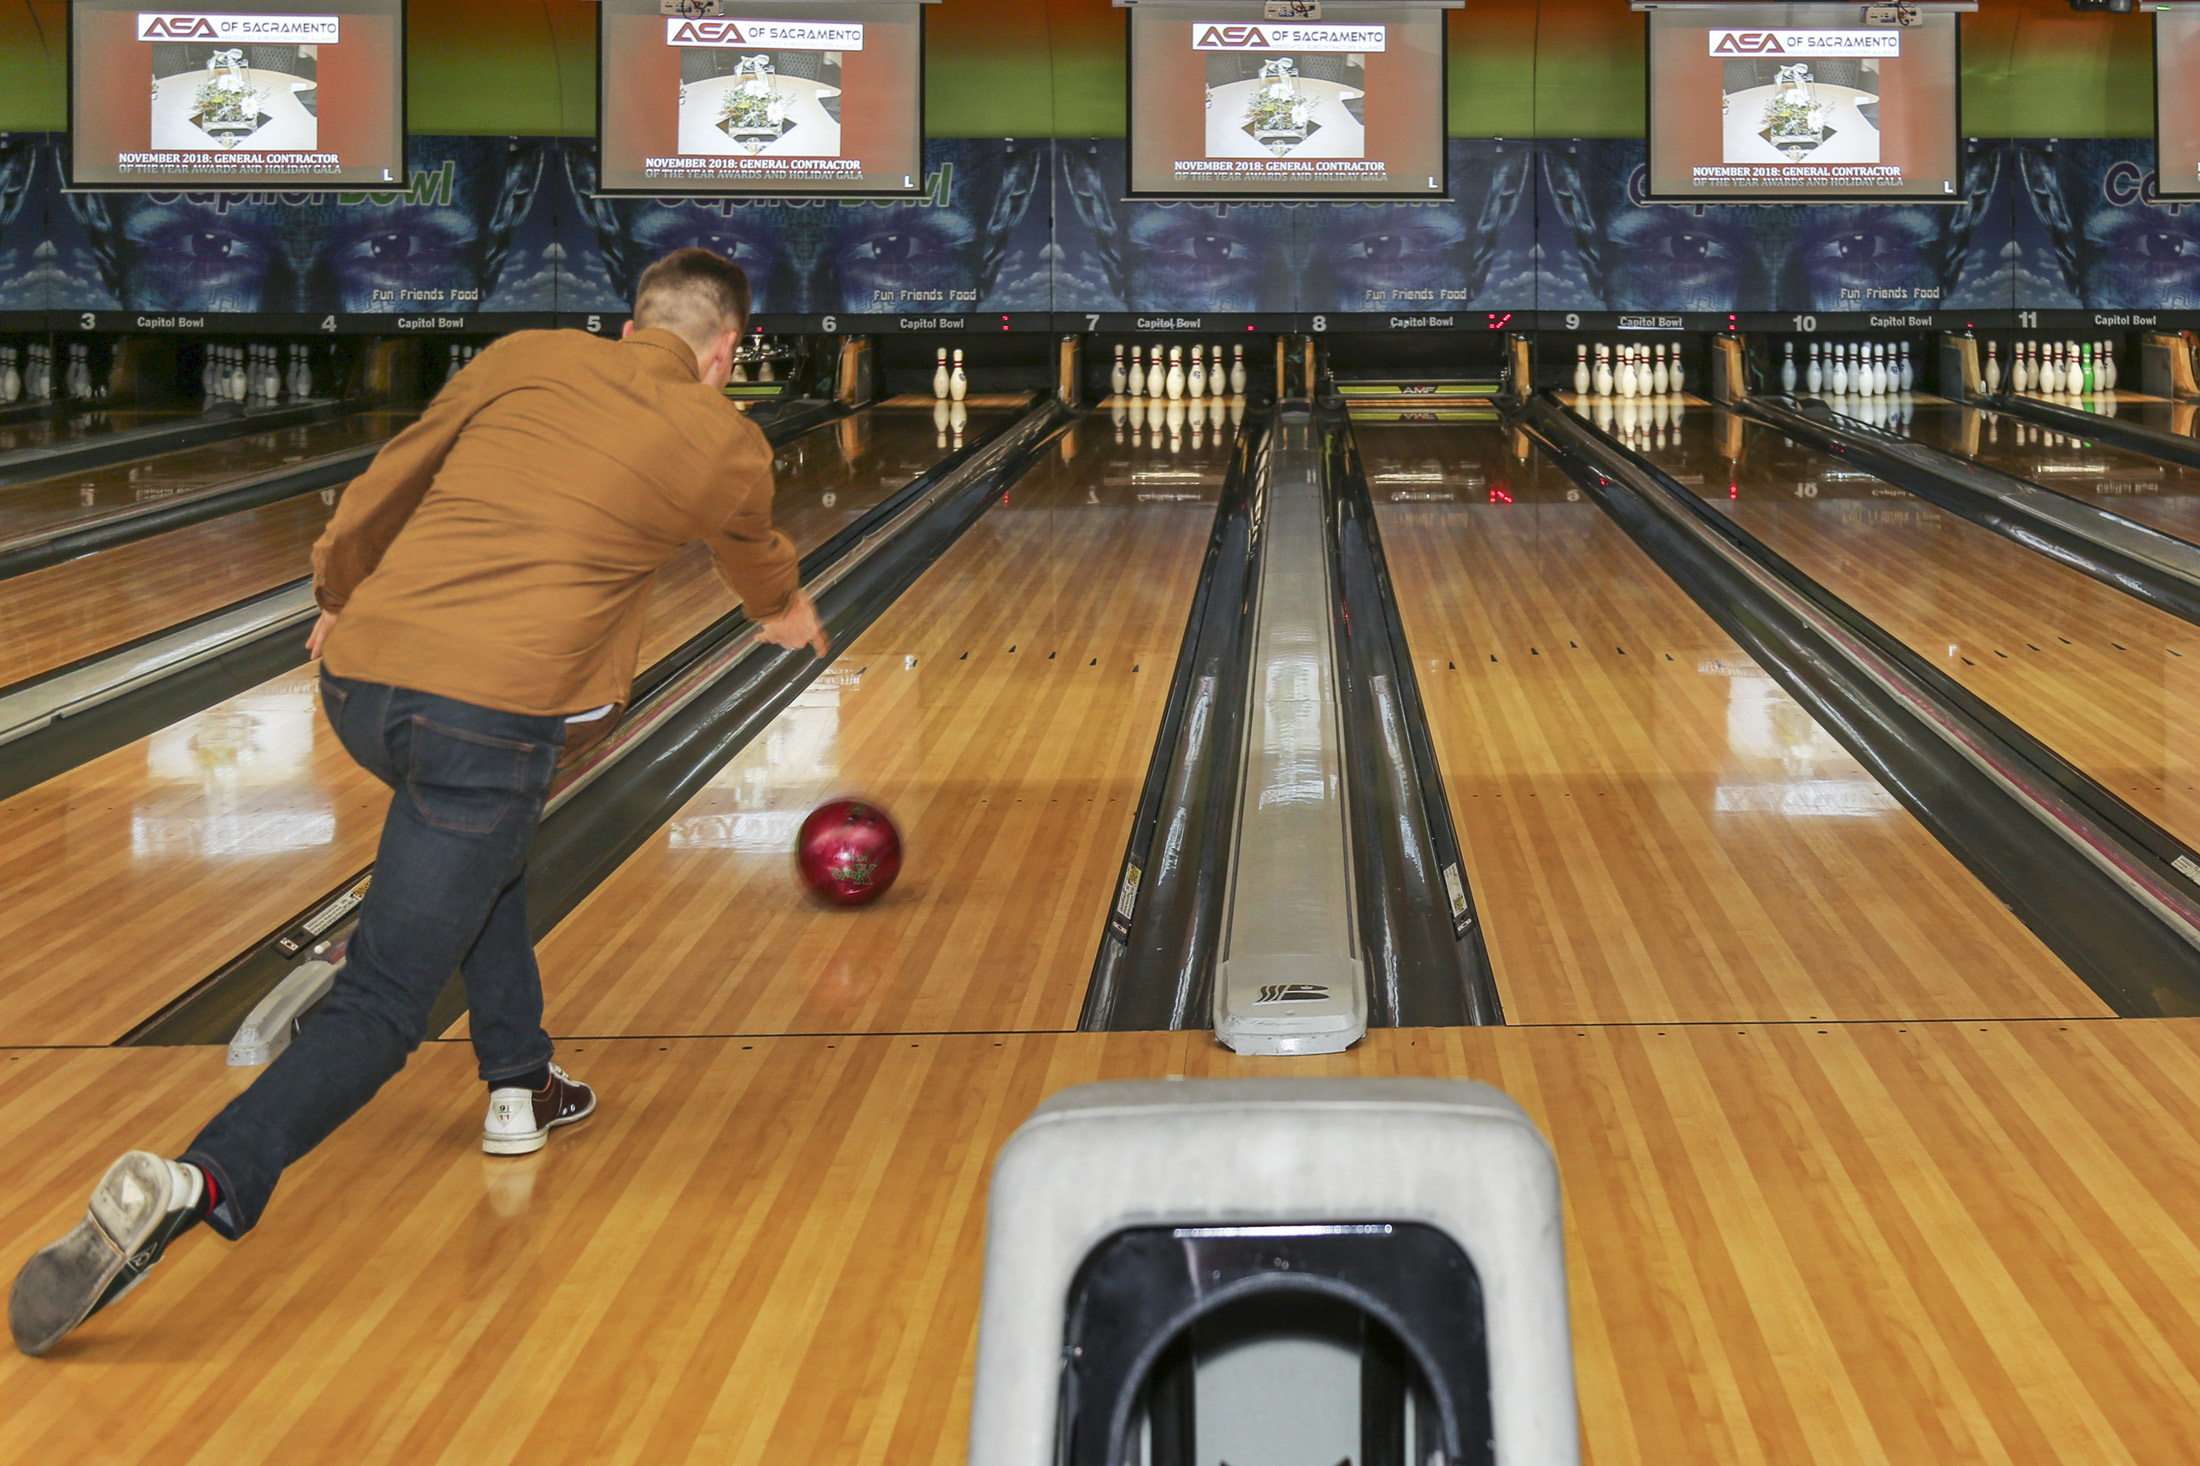 37_ASA Bowling Tourney 2019